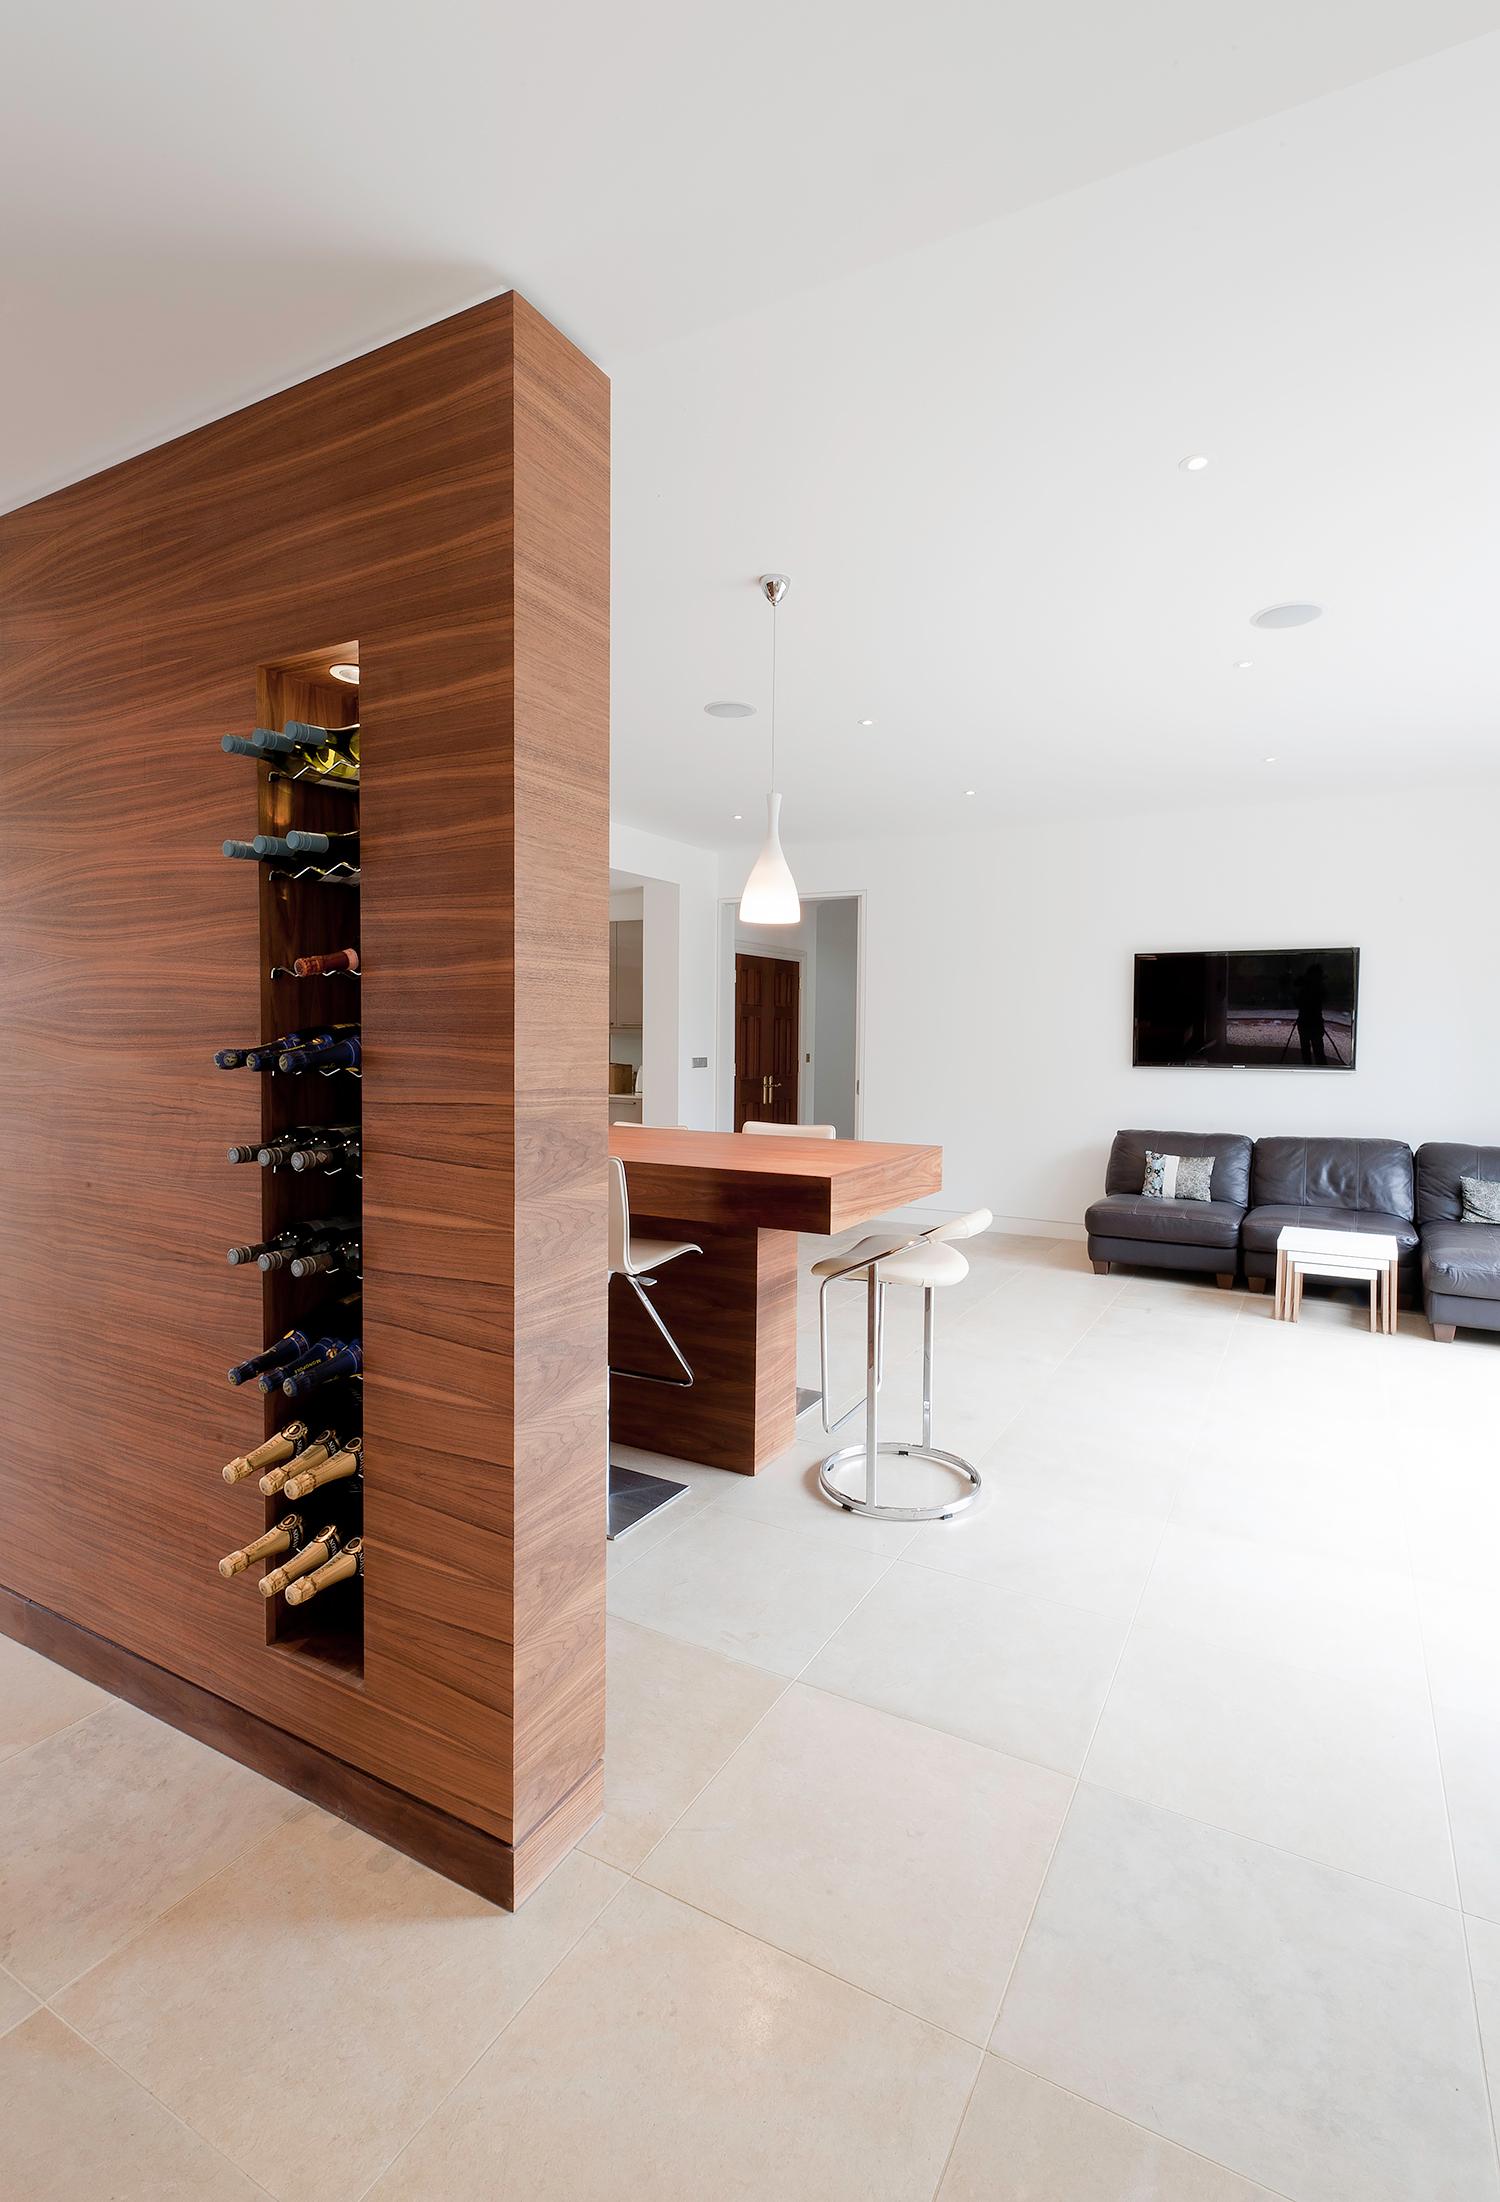 _interior-photography-residential-dorset-mileride-4.jpg